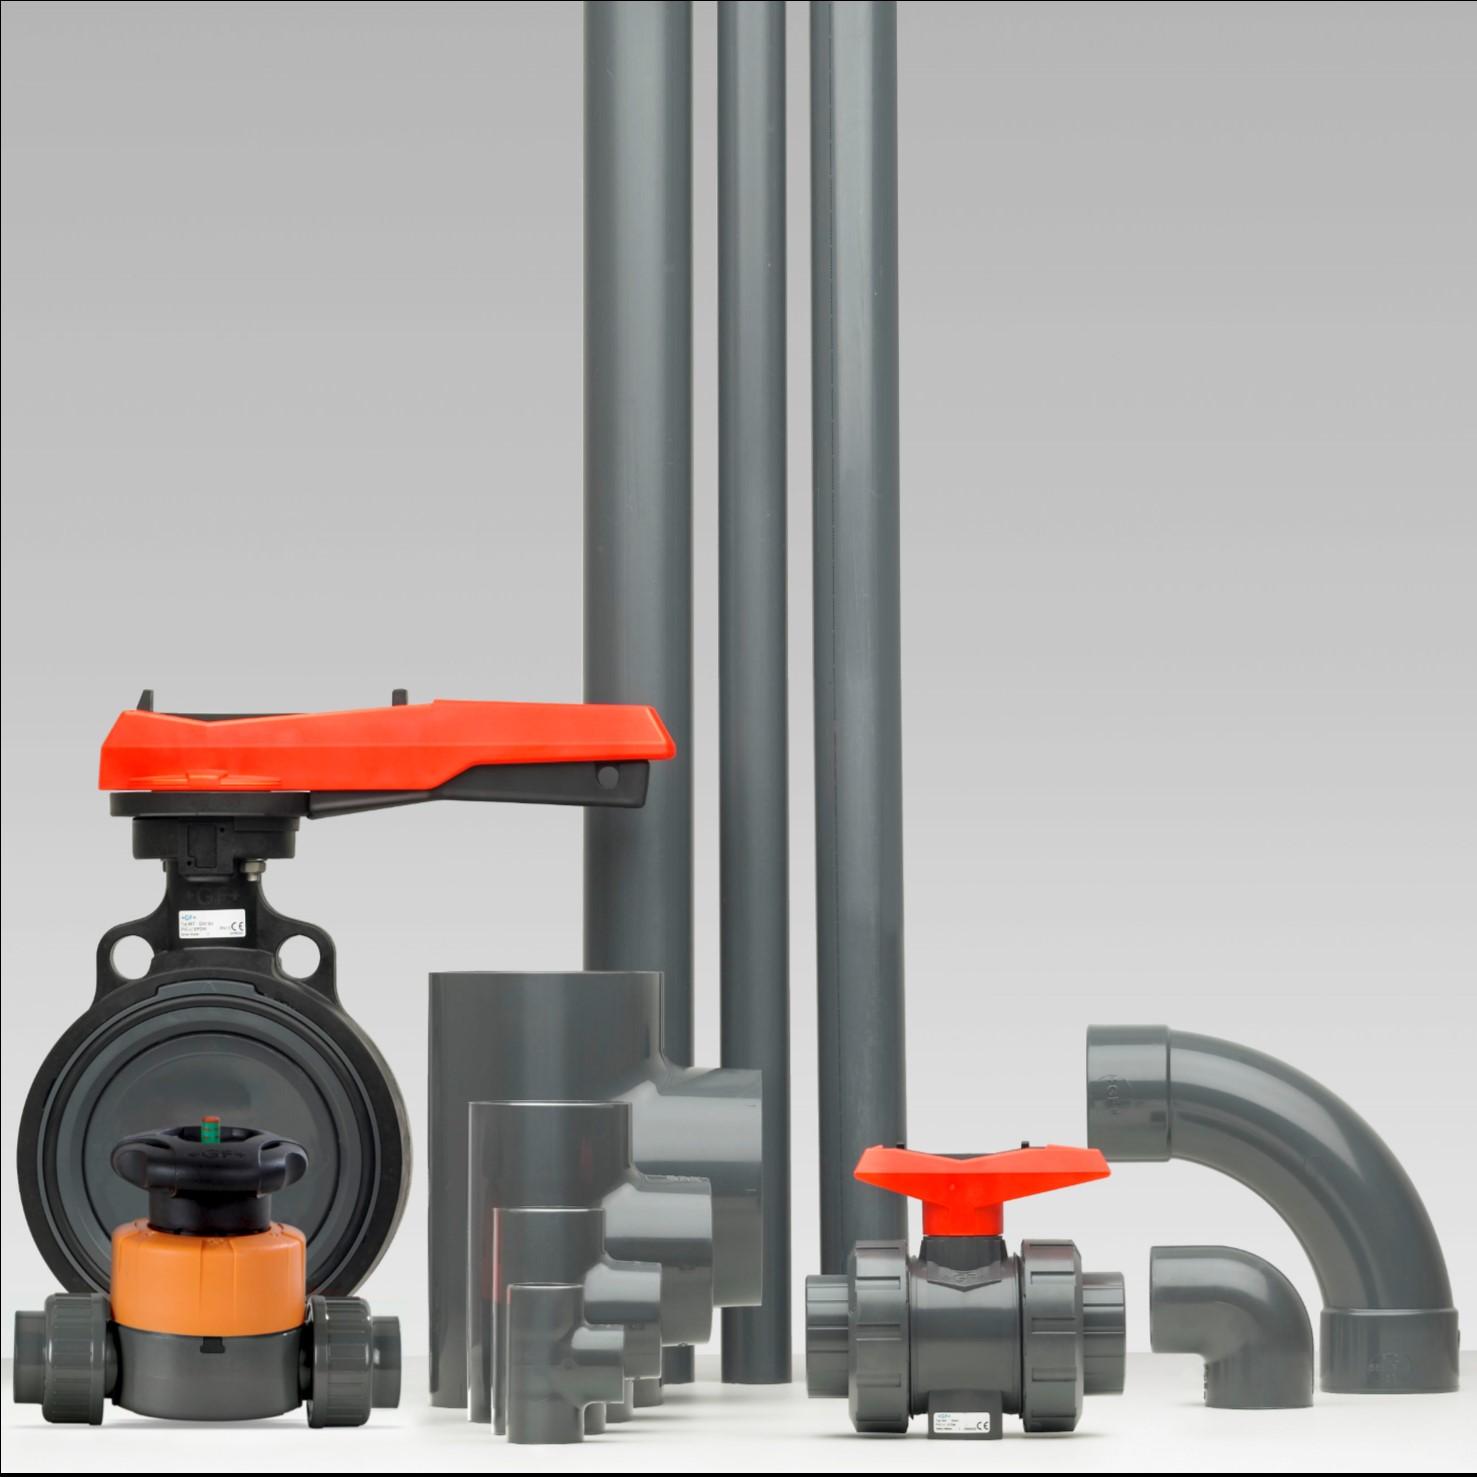 PVC-U kunststof industriële leidingsystemen